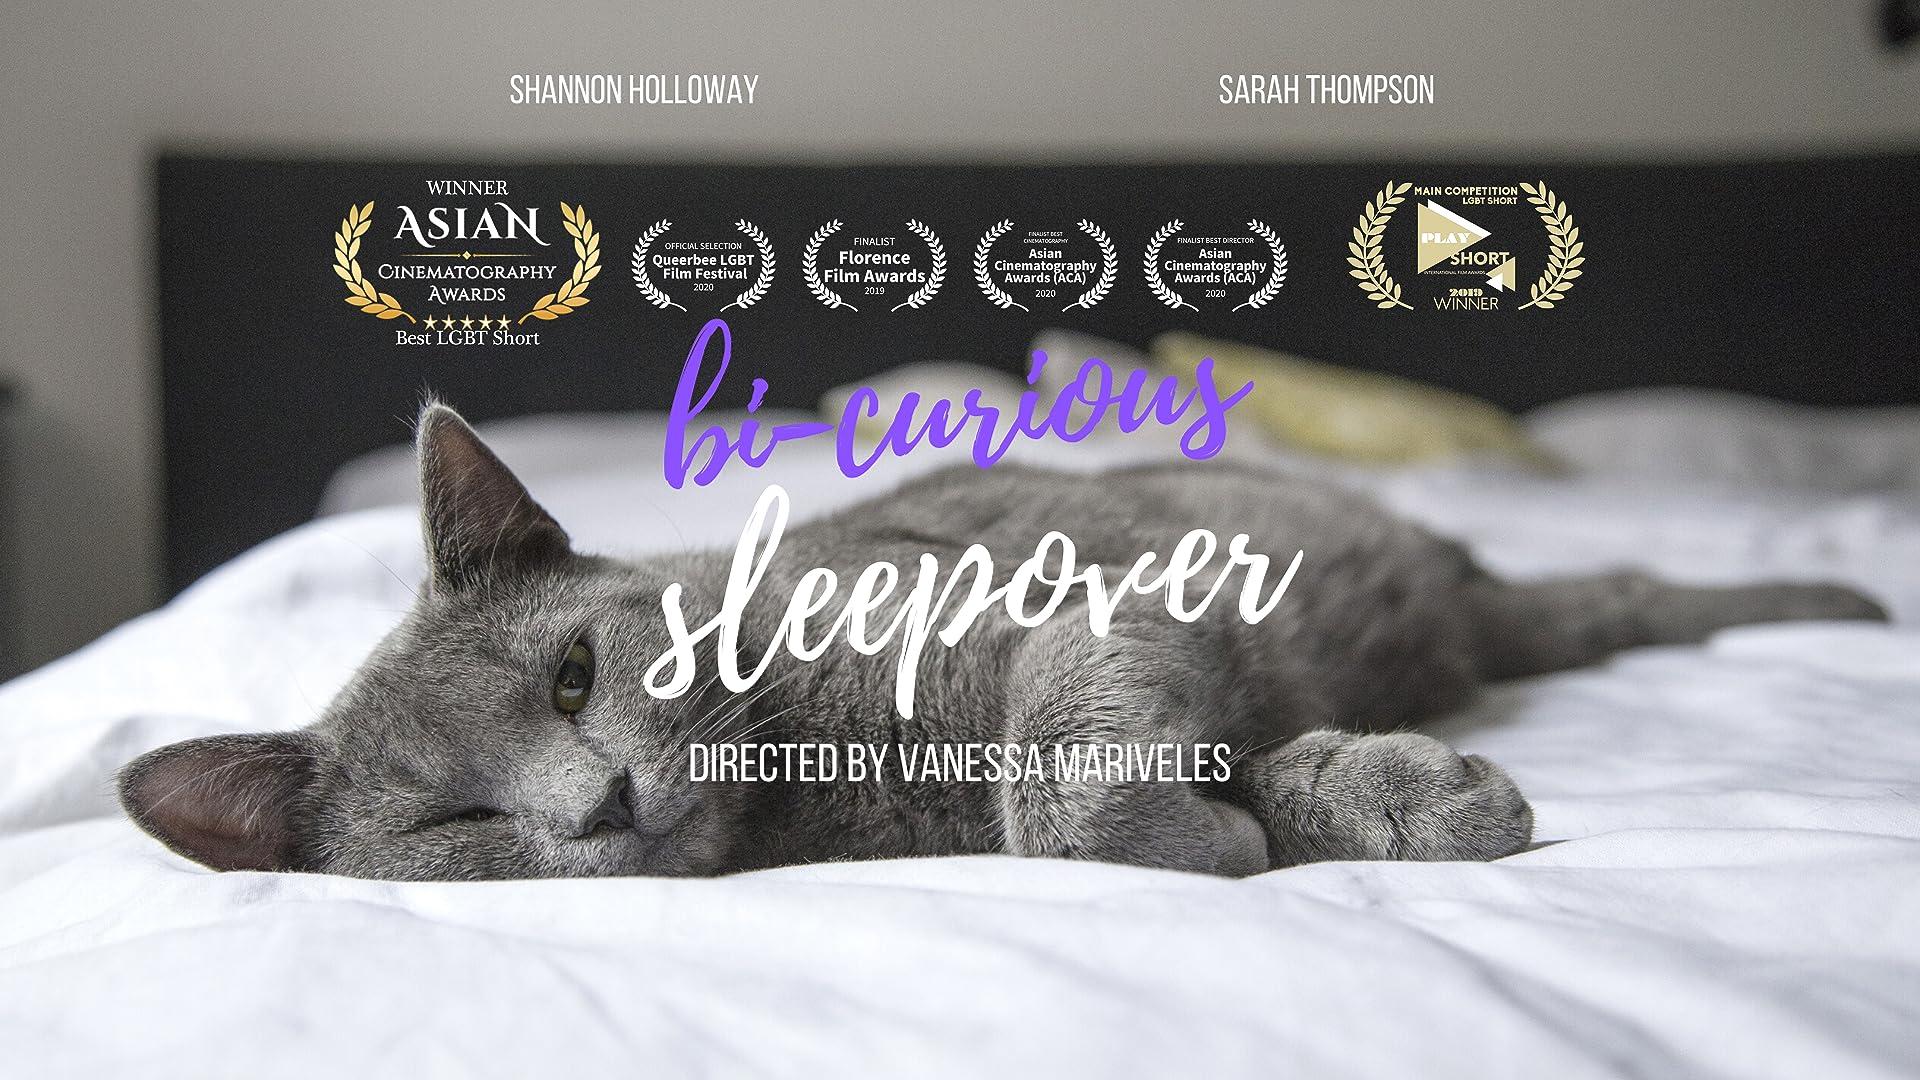 Bi-curious Sleepover